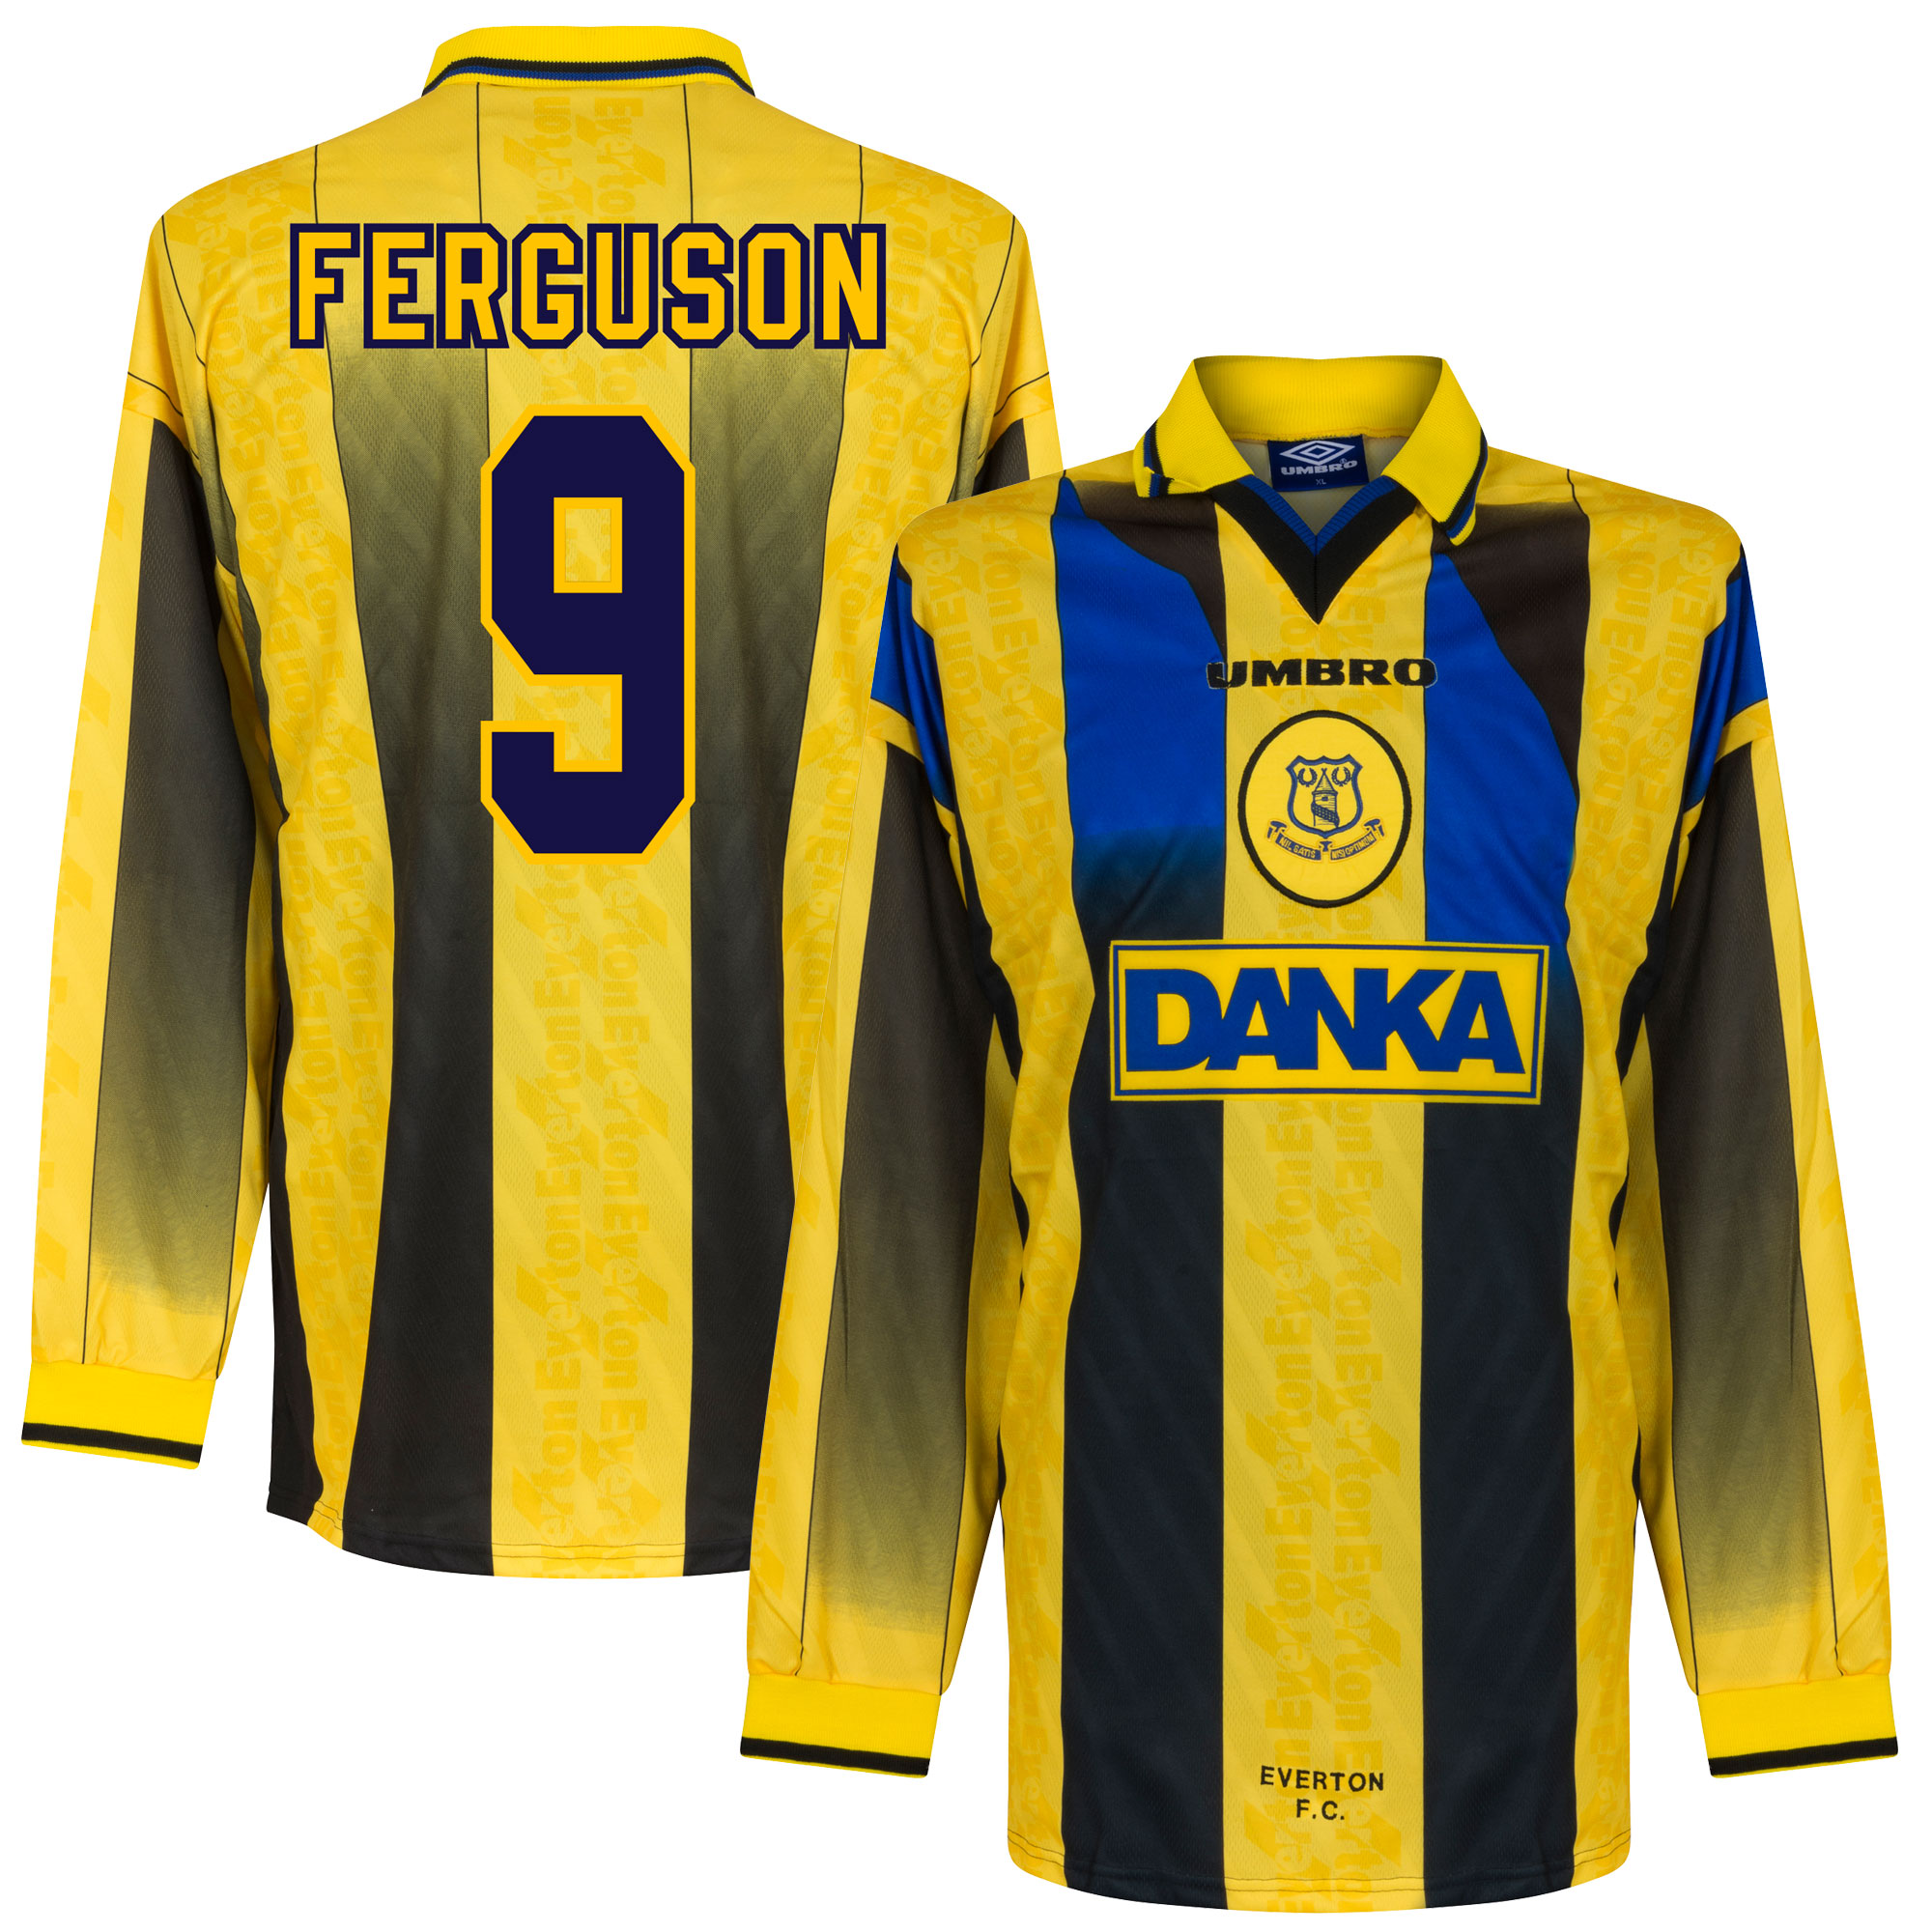 96-97 Everton Away L/S Players Jersey + Ferguson 9 - XL